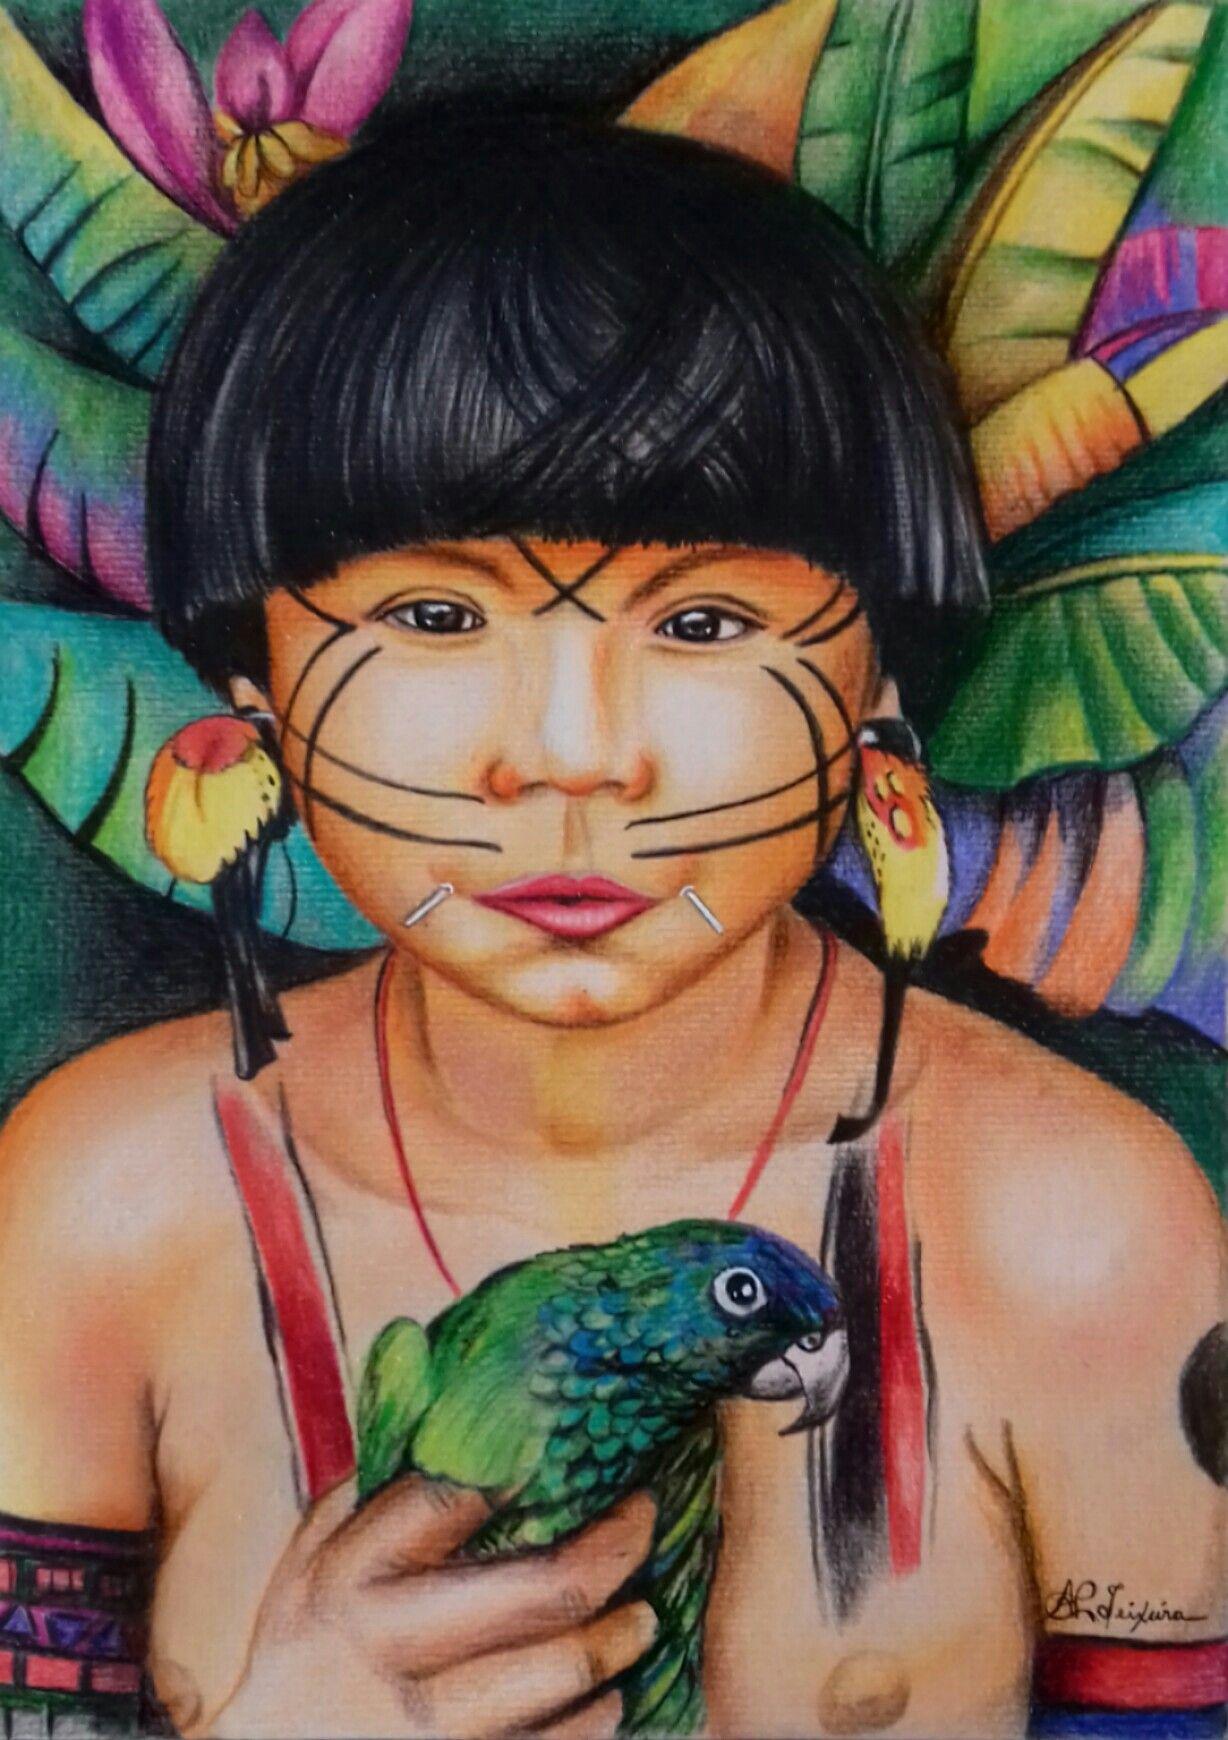 Indio Pintura Com Lapis De Cor By Ana Paula Campos Teixeira